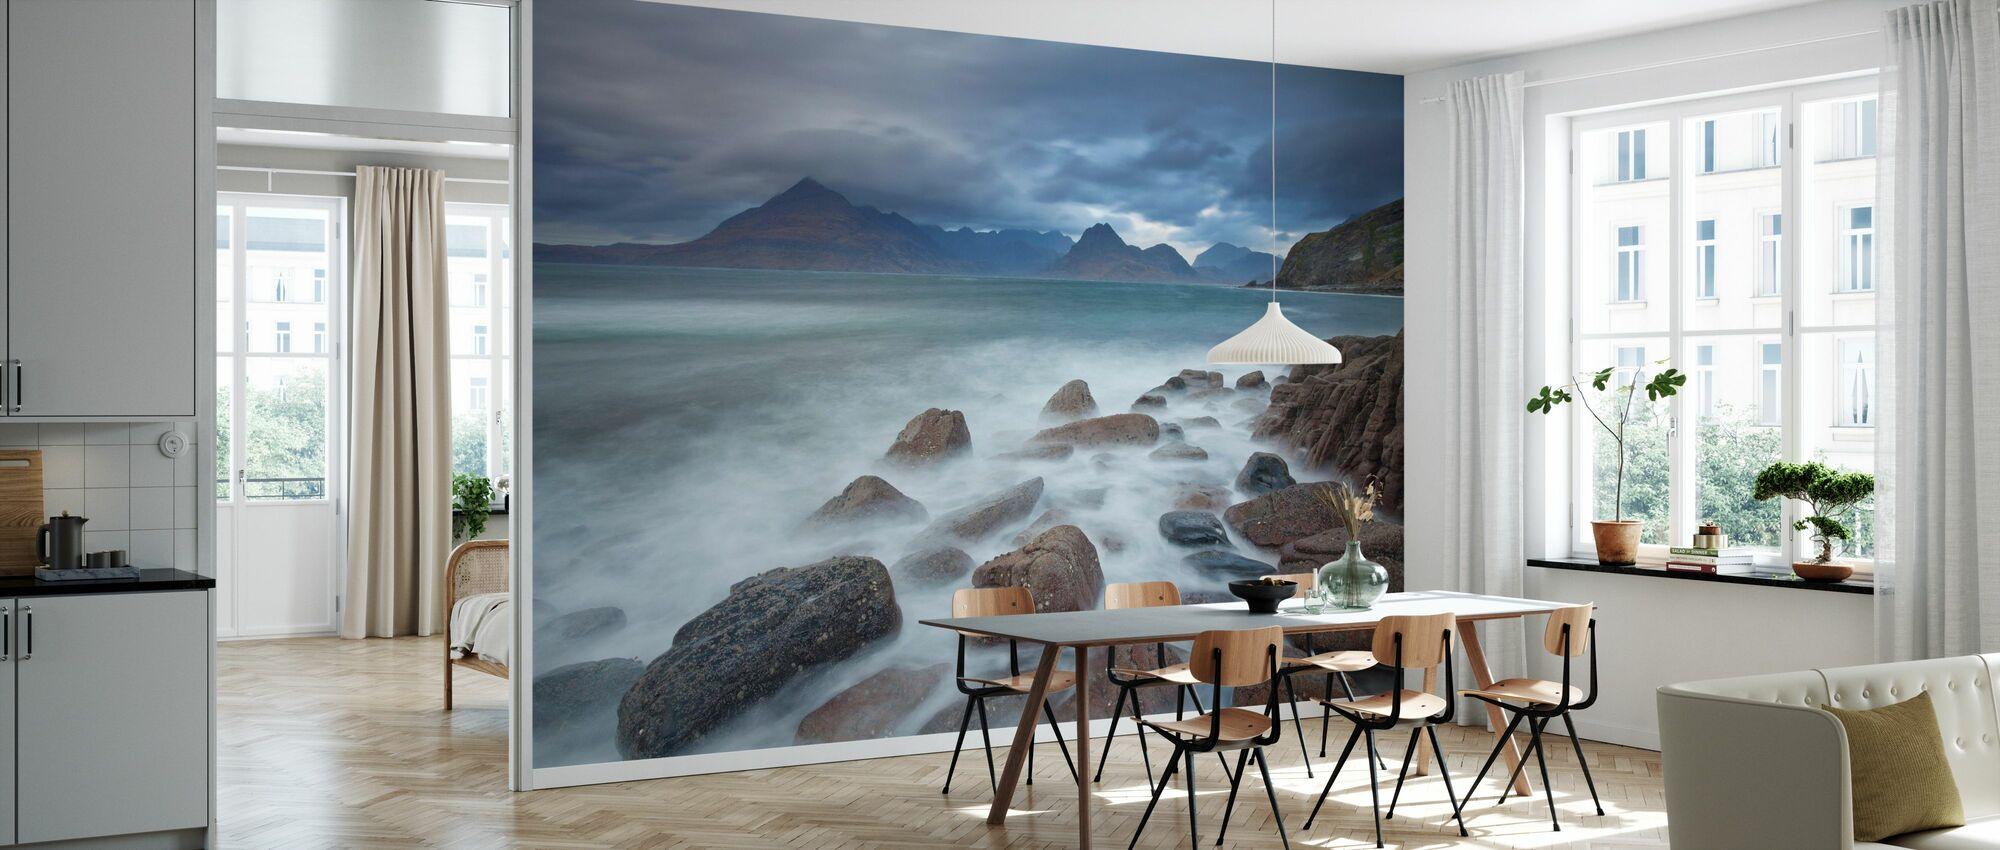 Isle of Skye - Wallpaper - Kitchen